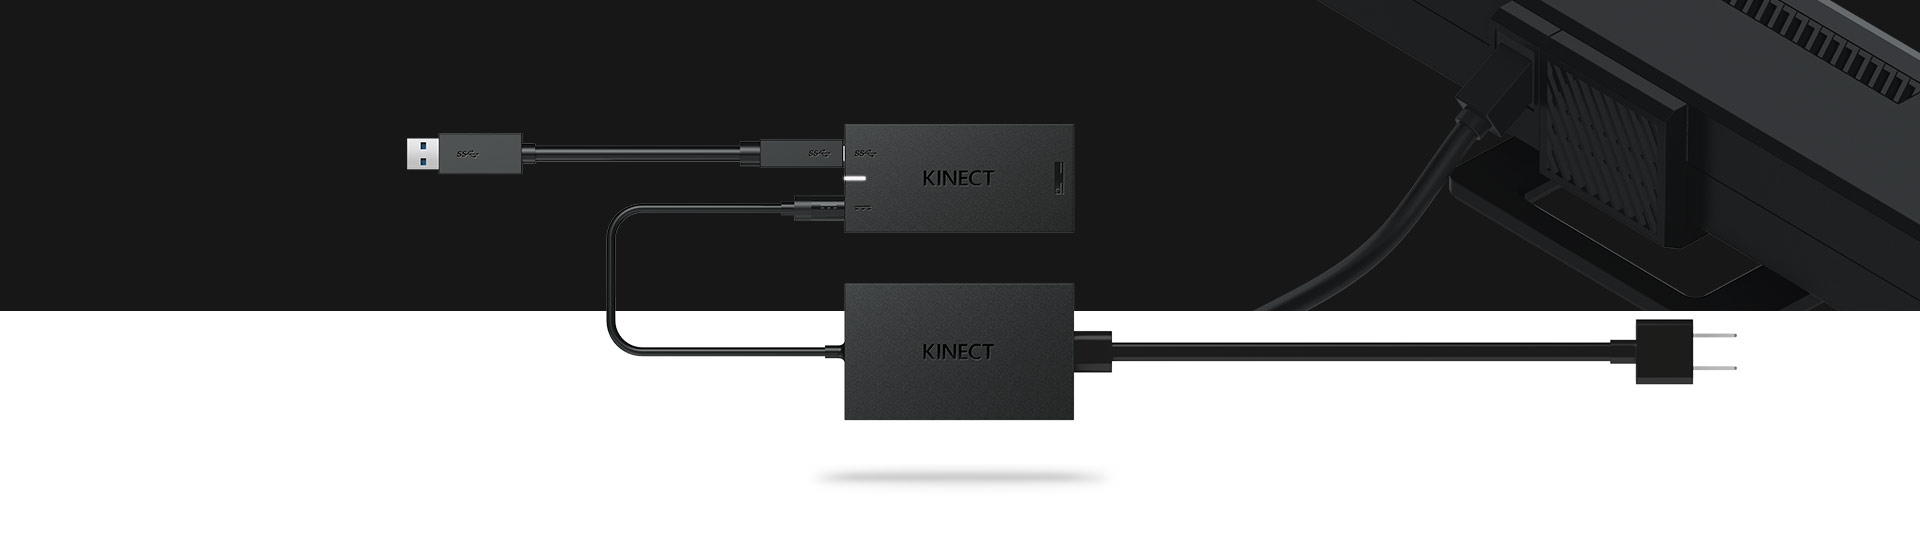 Microsoft прекратила выпуск адаптеров Kinect для Xbox One